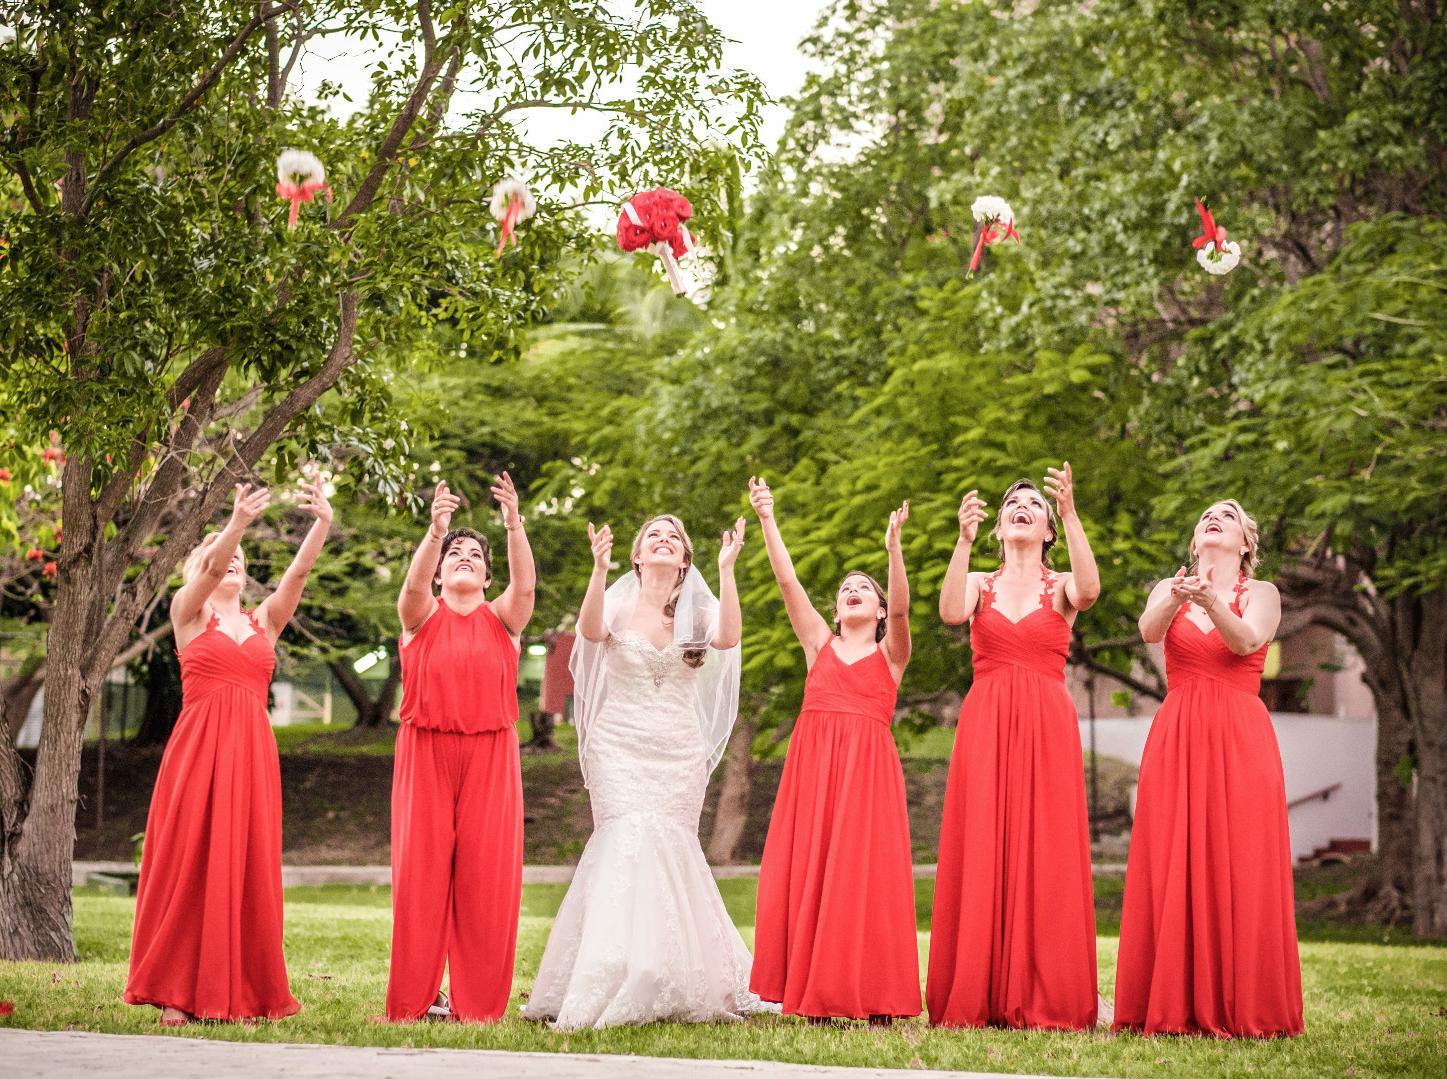 bodas-sin-clasificar-sin-tema-cuba-28301.jpg